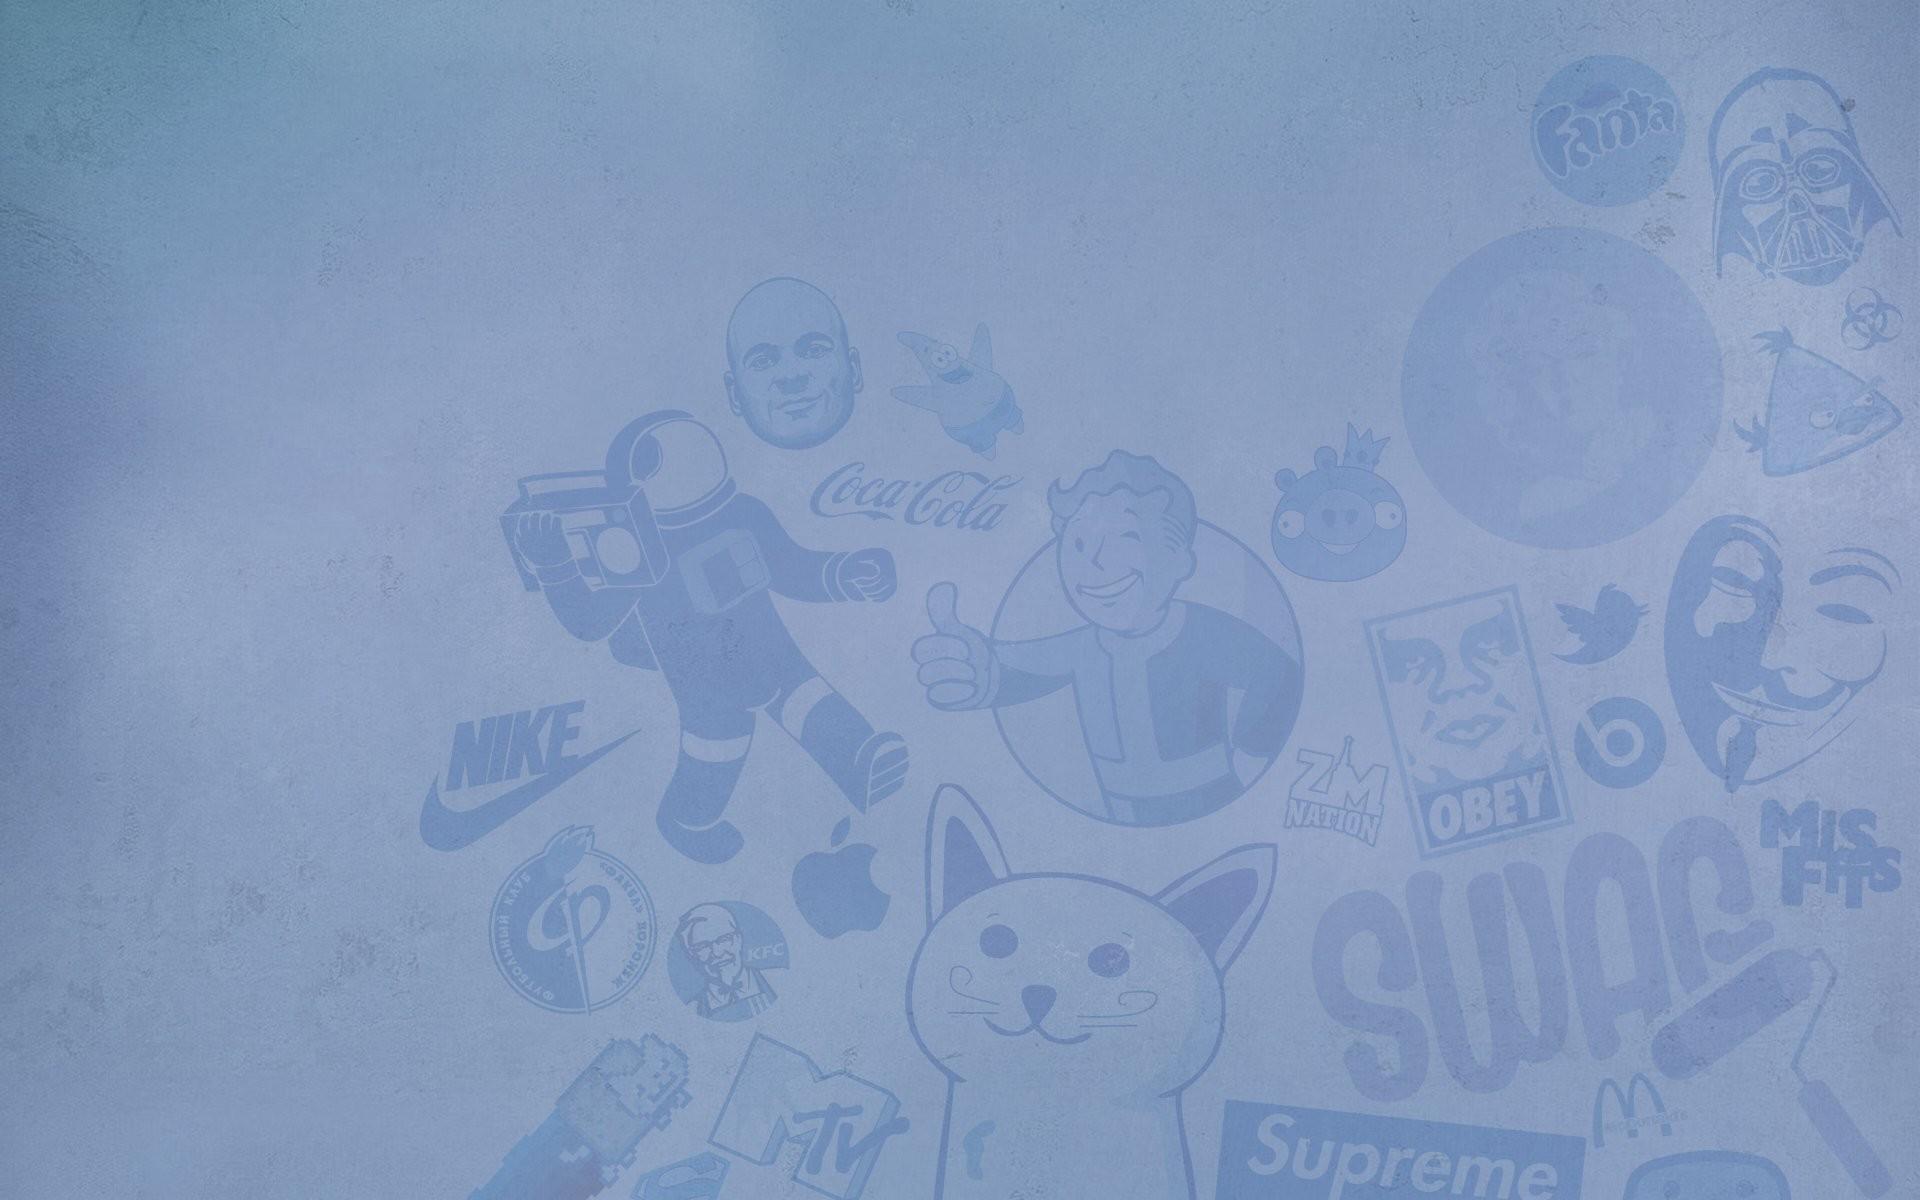 brand obey mcdonalds nike supreme superman fallout